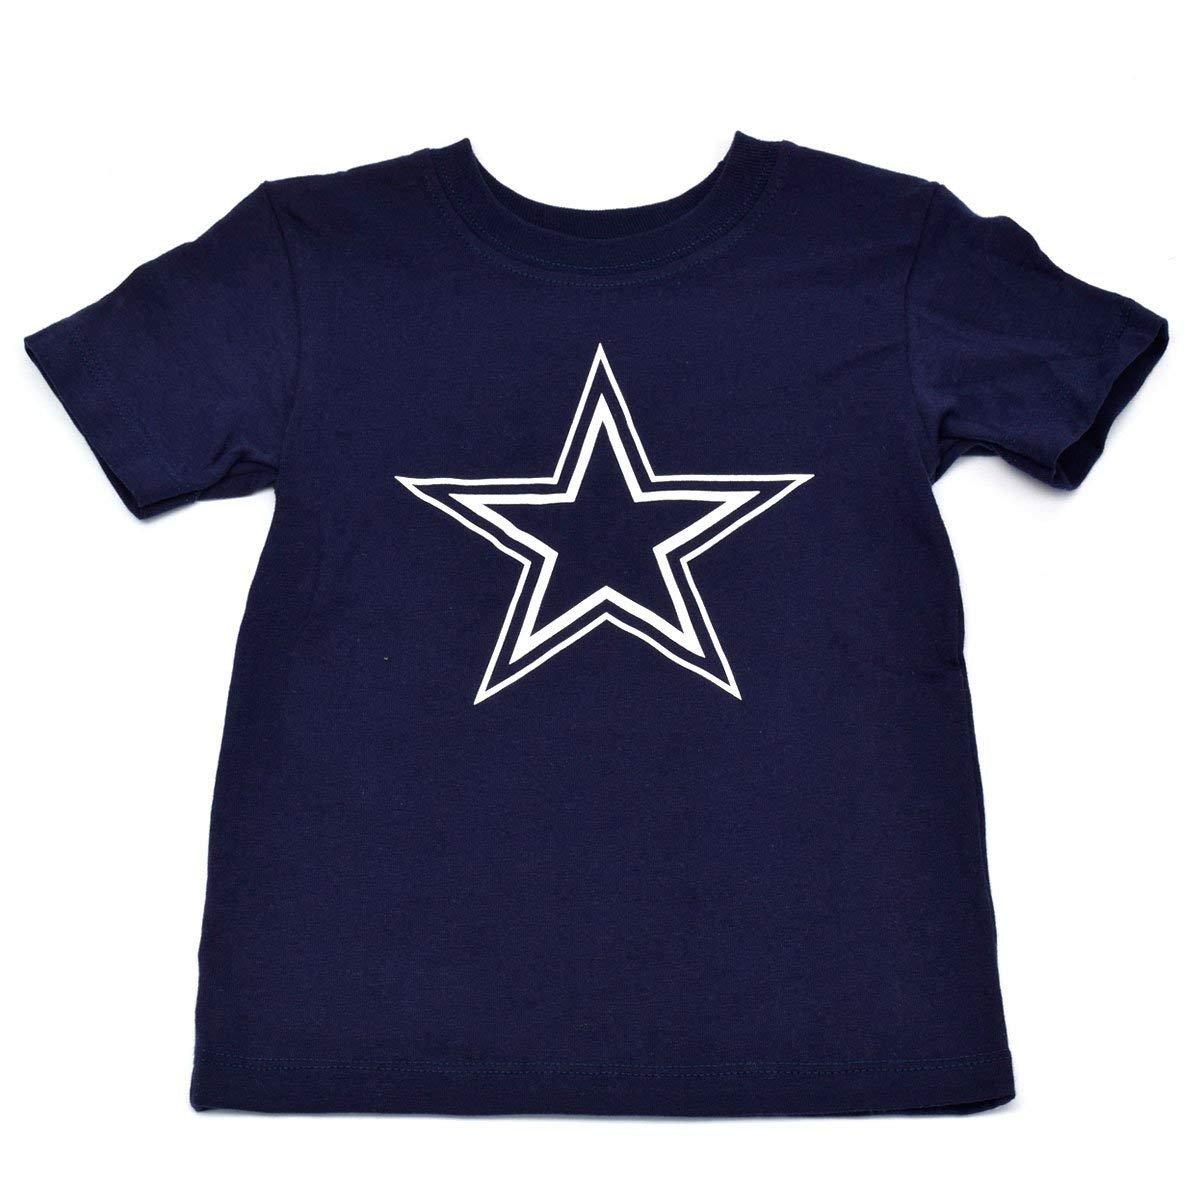 Dallas Cowboys Toddlers Navy Logo Premier T-Shirt